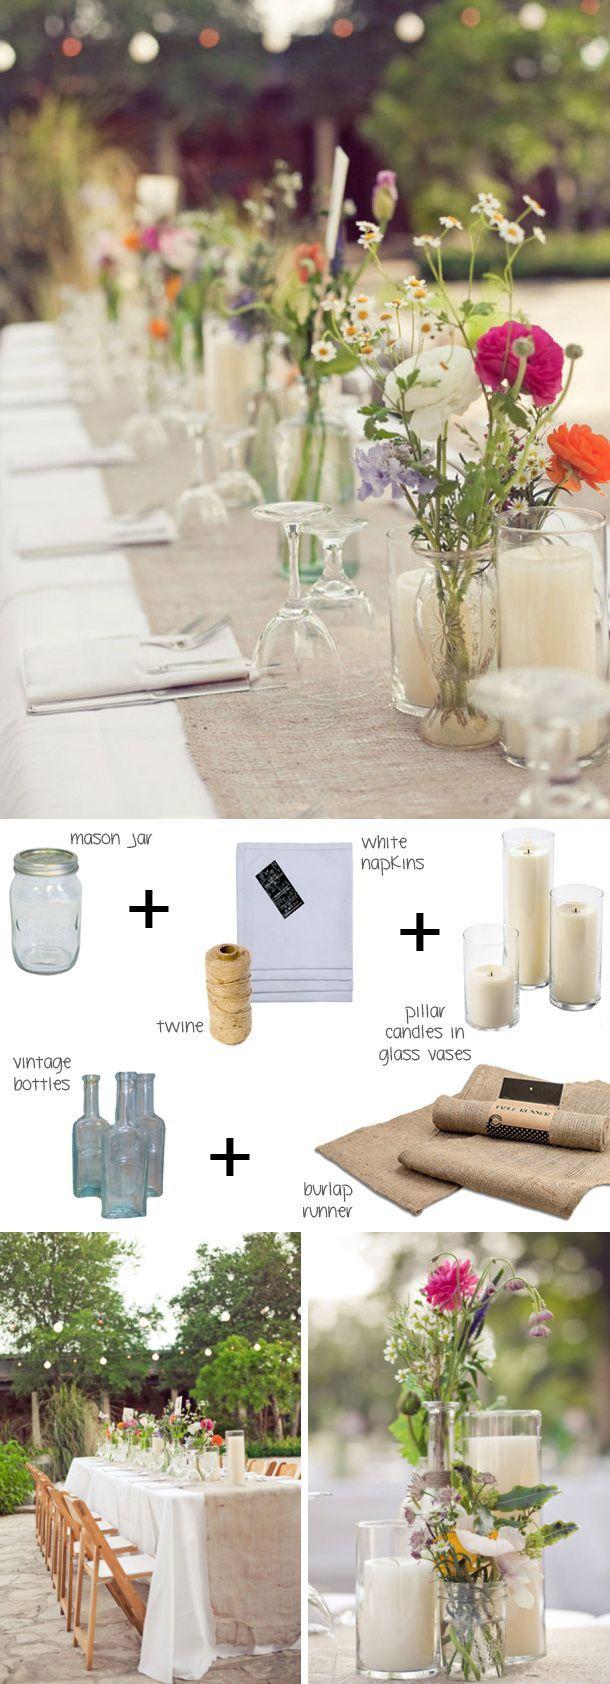 Ten Tables: Boho {Part 2} | Budgeting, Boho and Wedding